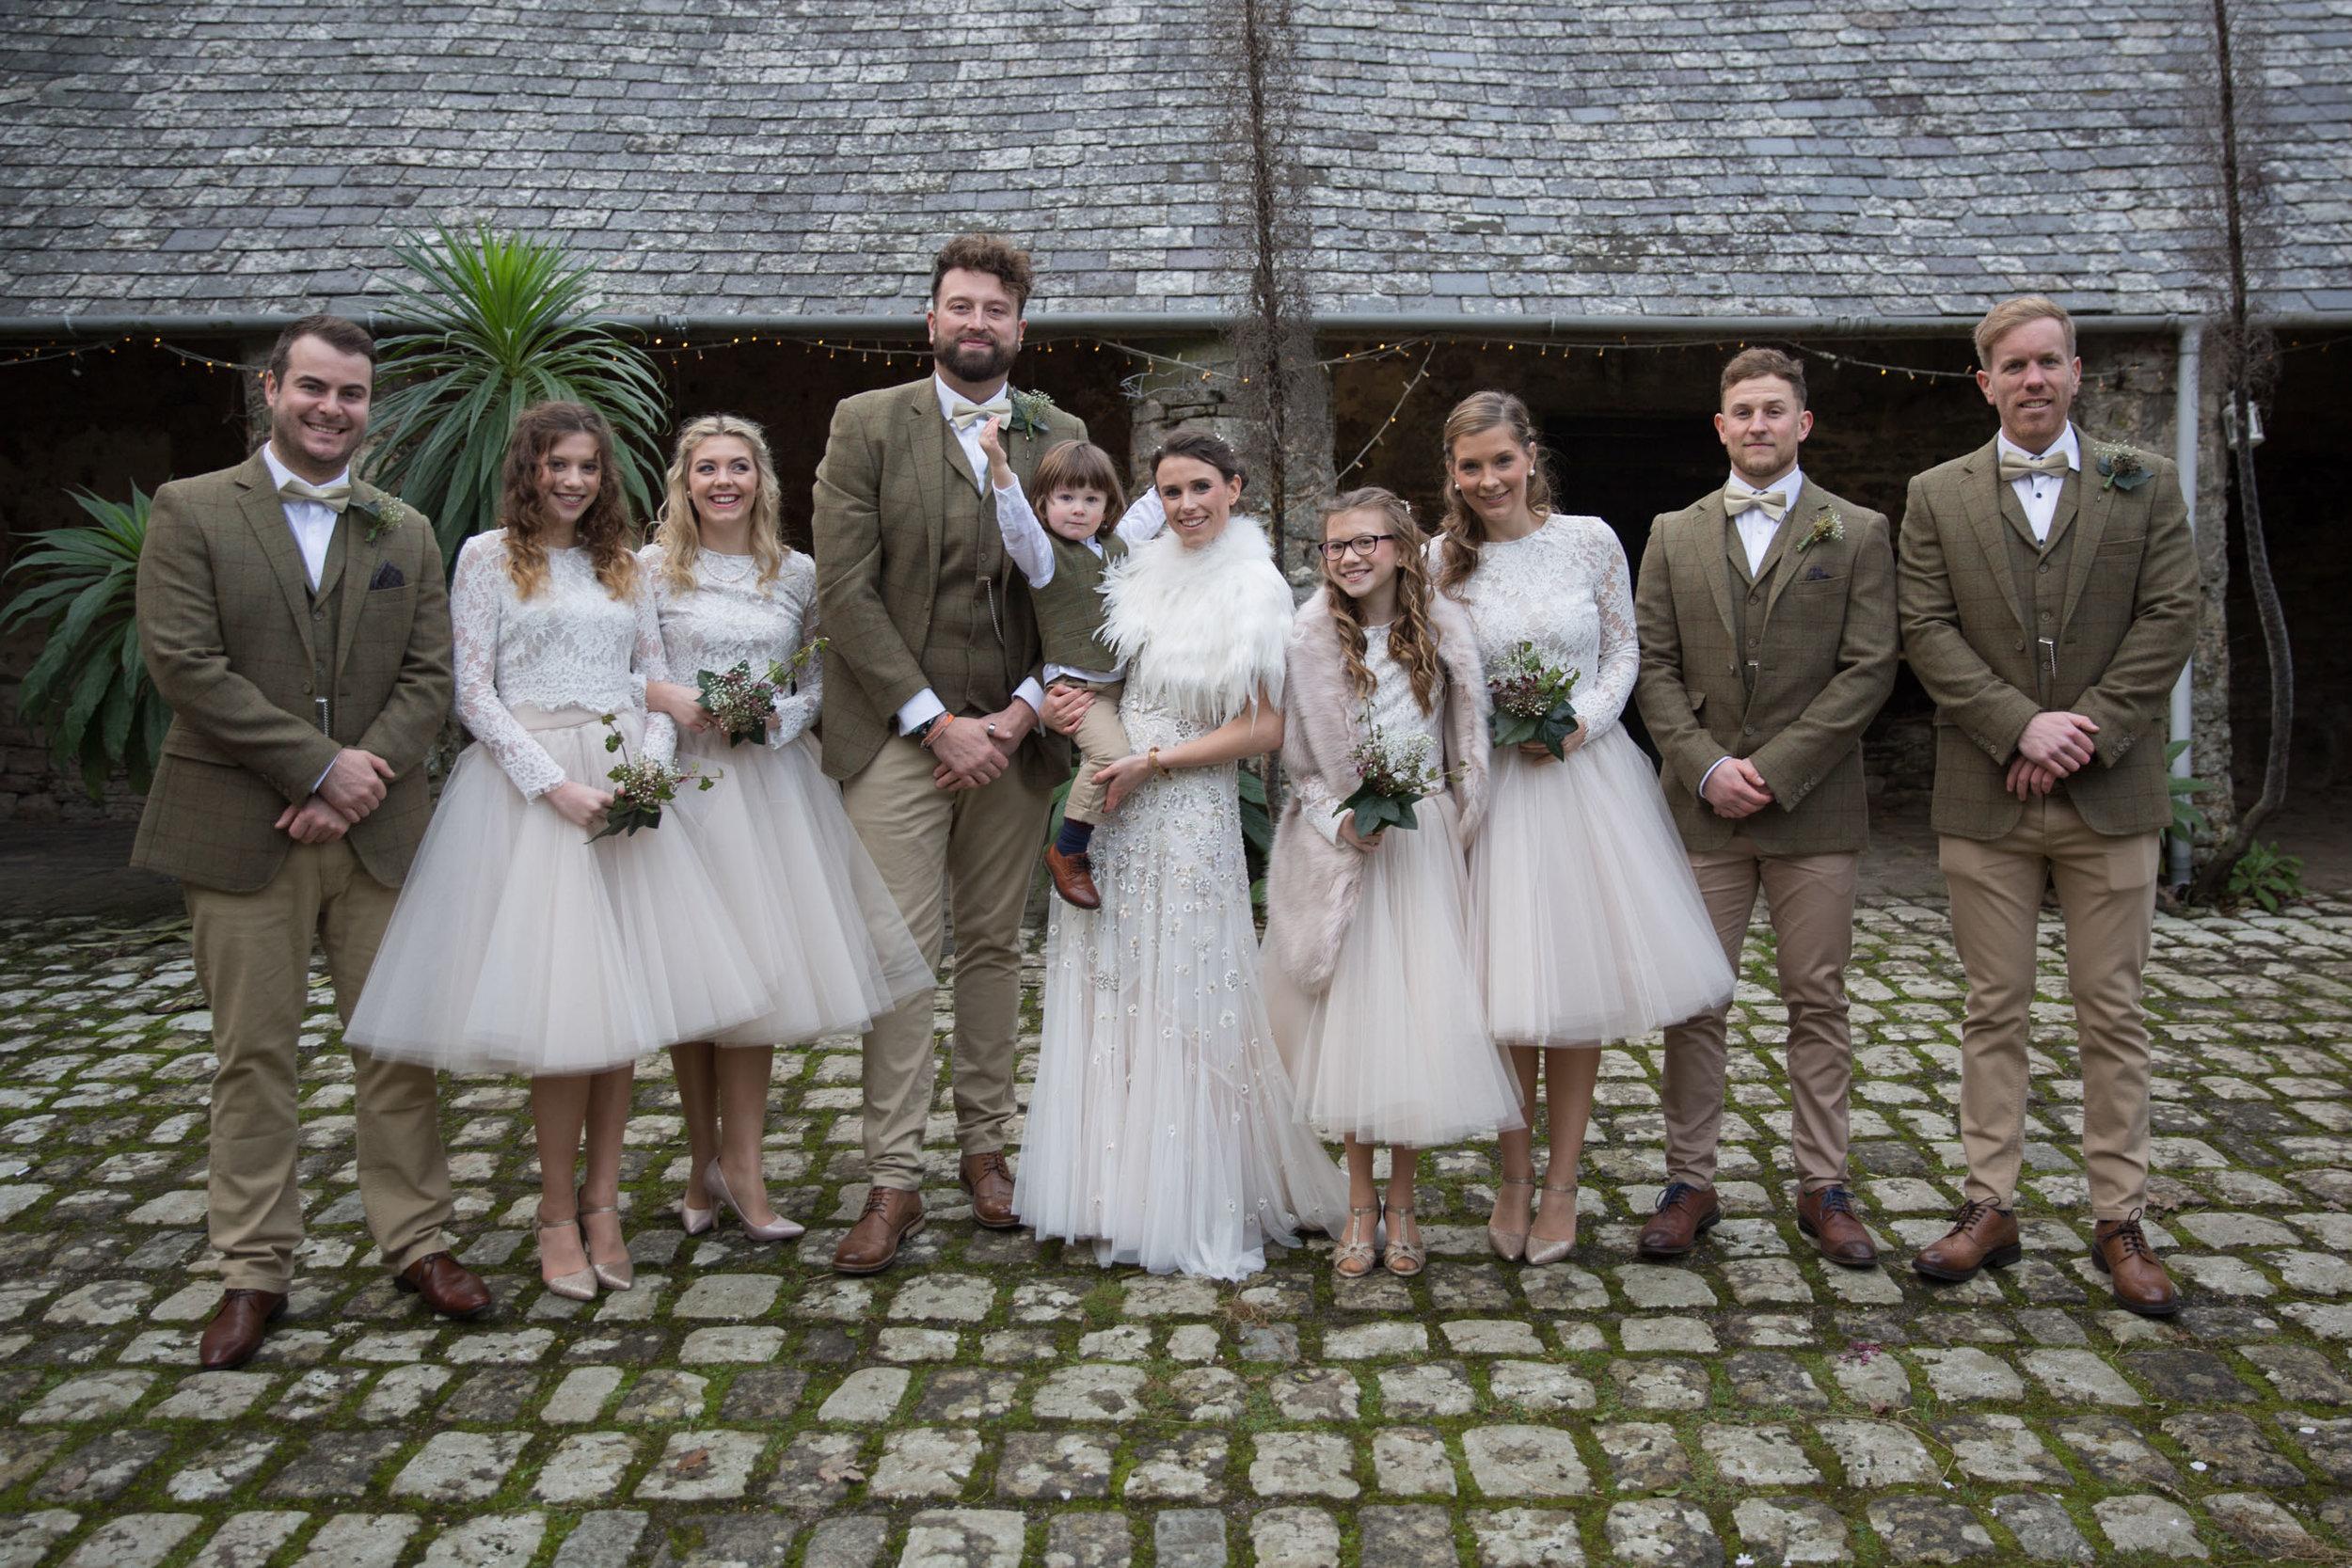 Jess & Ben - Bristol Wedding Photographer - Wright Wedding Photography - 98